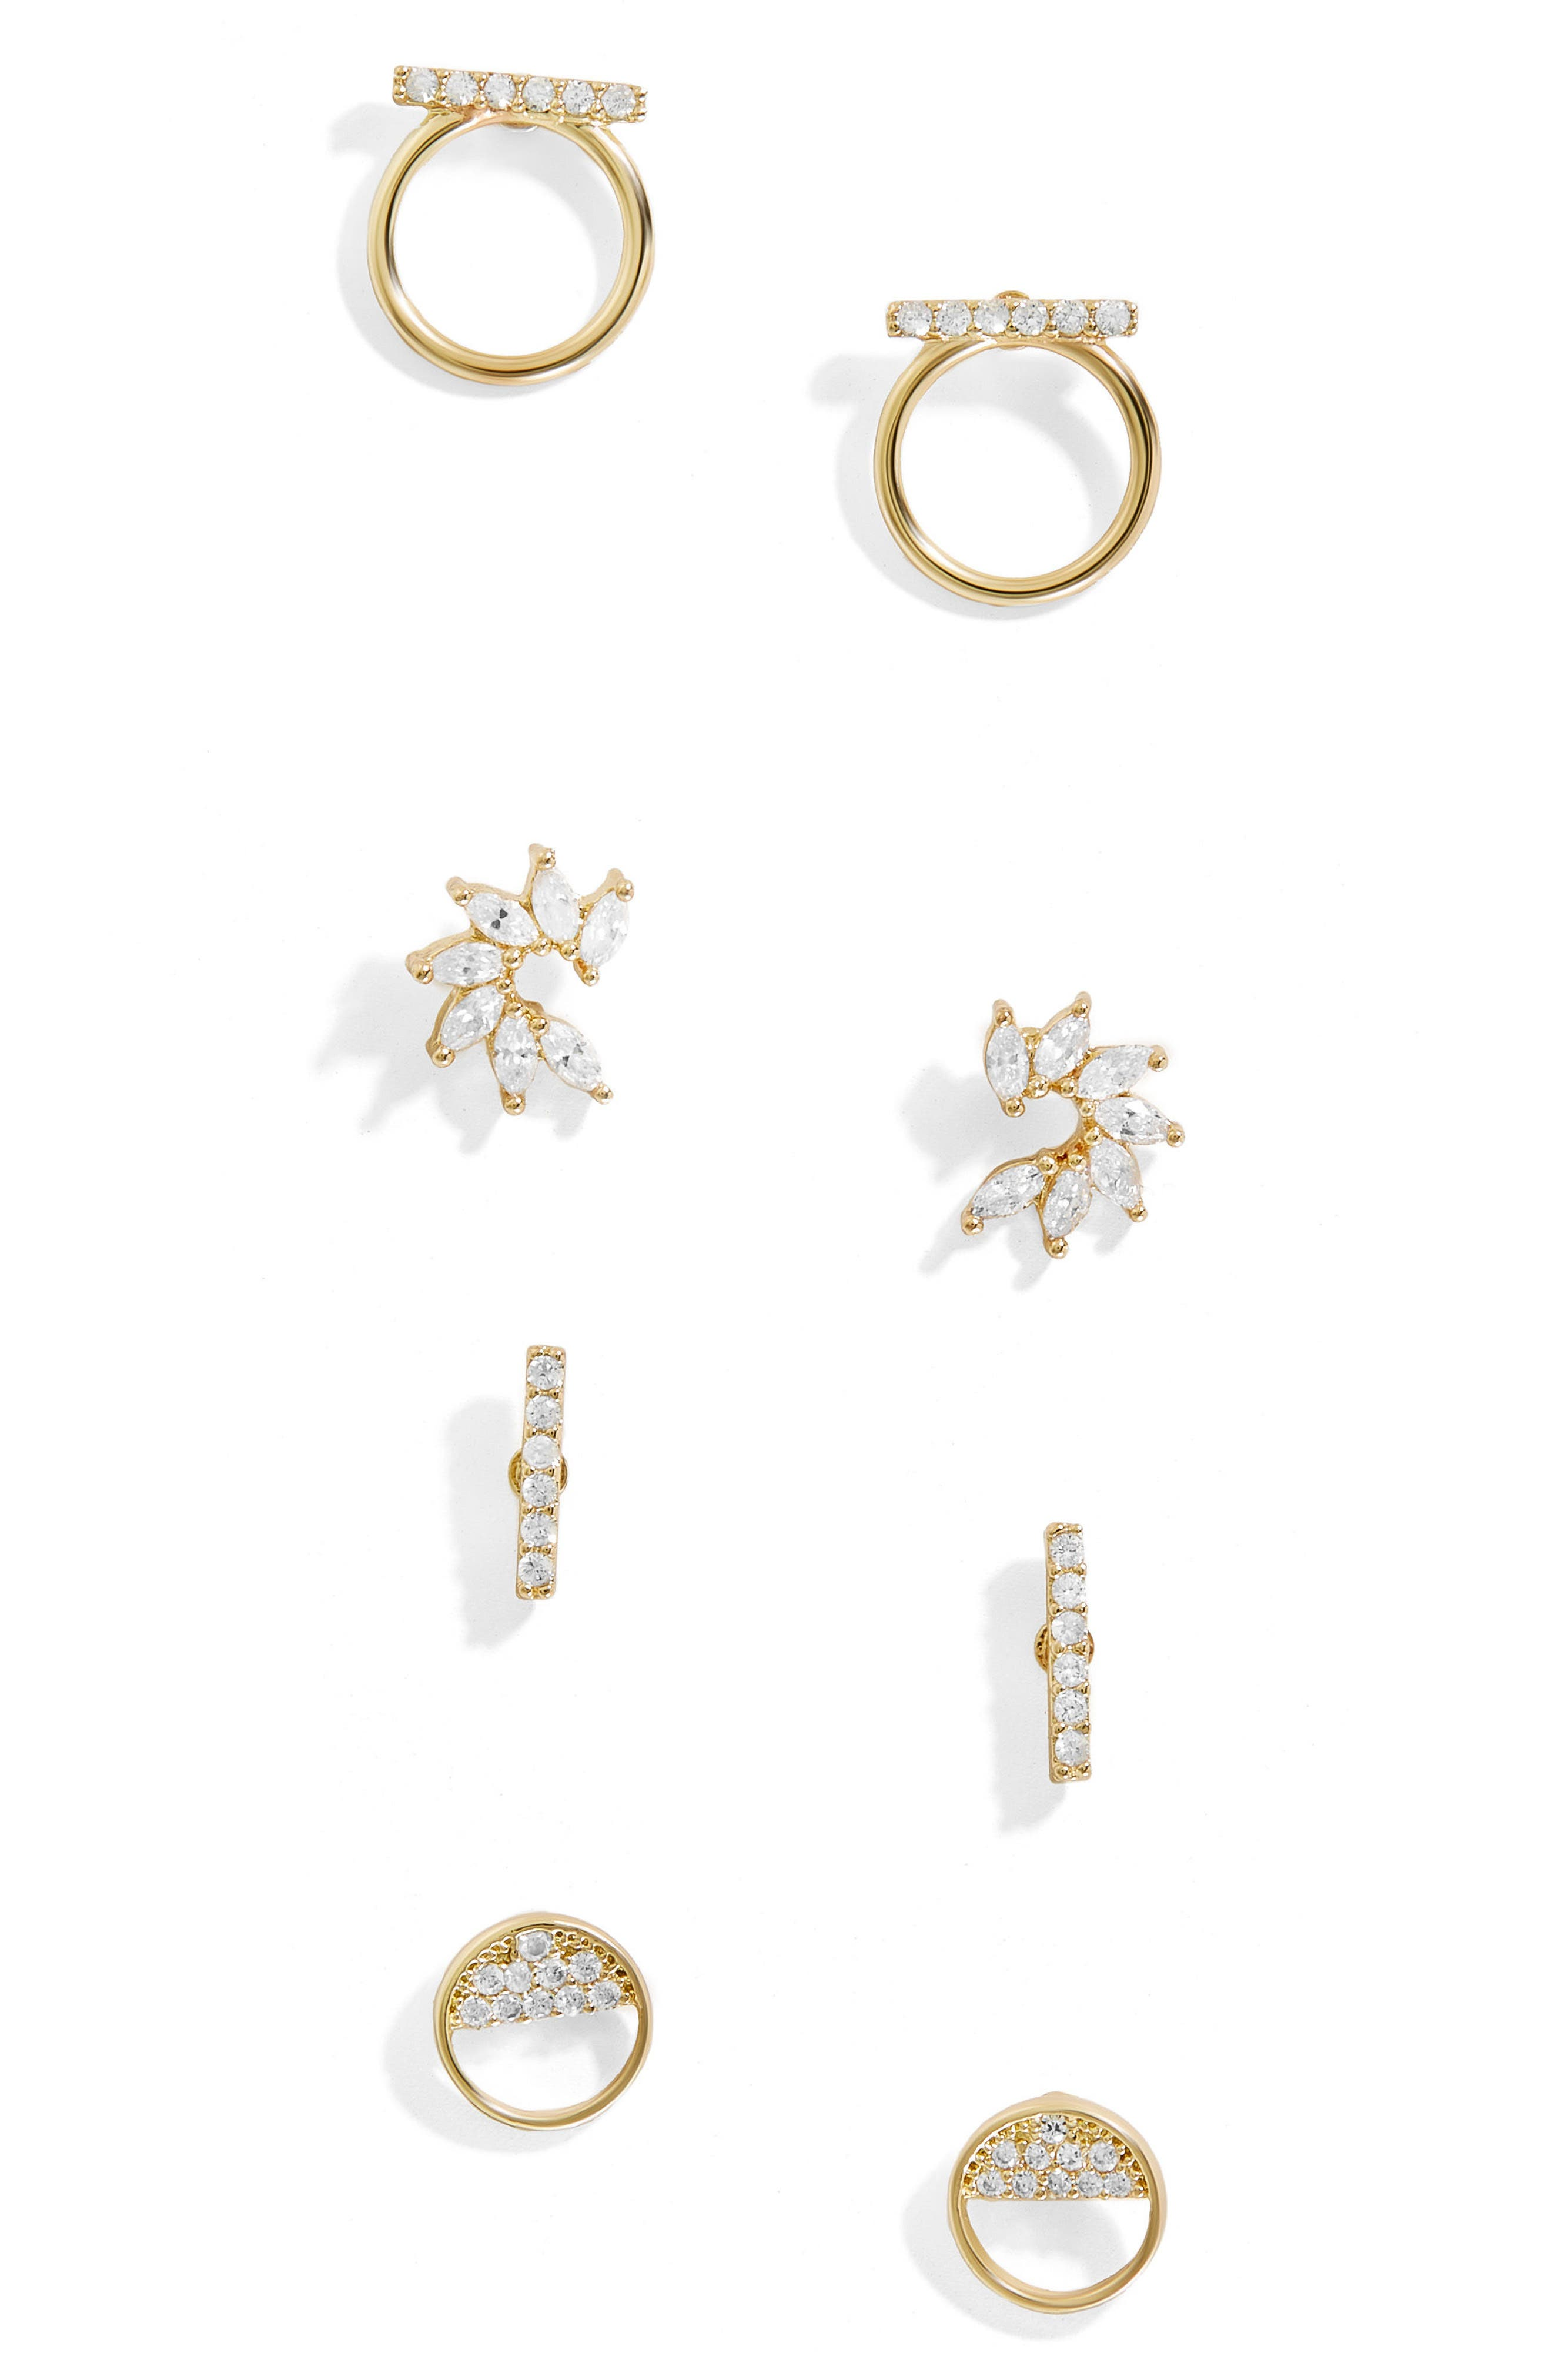 Delicate Set of 4 Stud Earrings,                             Main thumbnail 1, color,                             GOLD